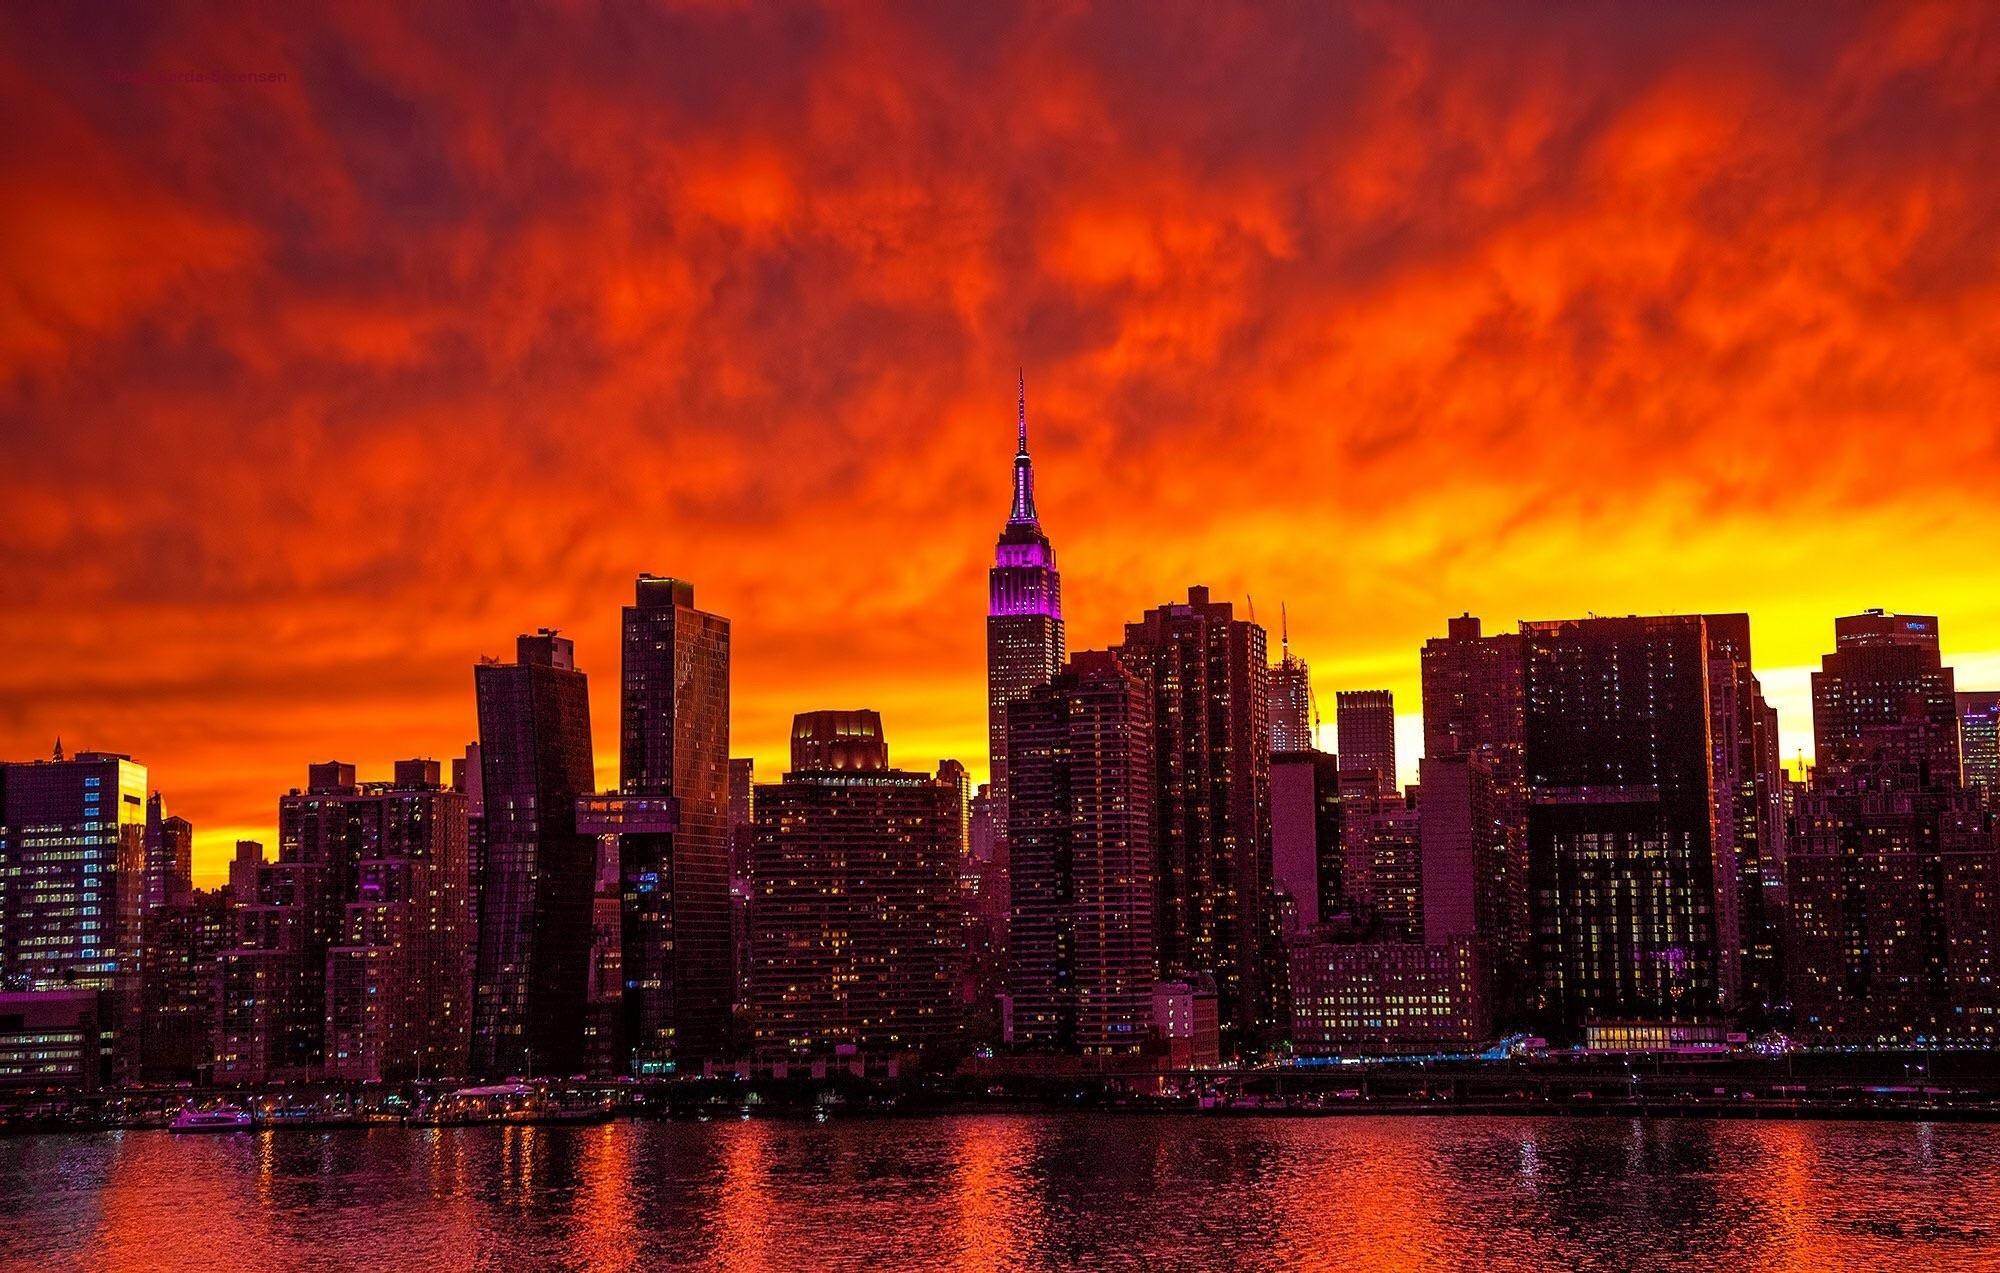 General 2000x1273 cityscape building Manhattan skyscraper sky red orange colorful New York City USA skyline